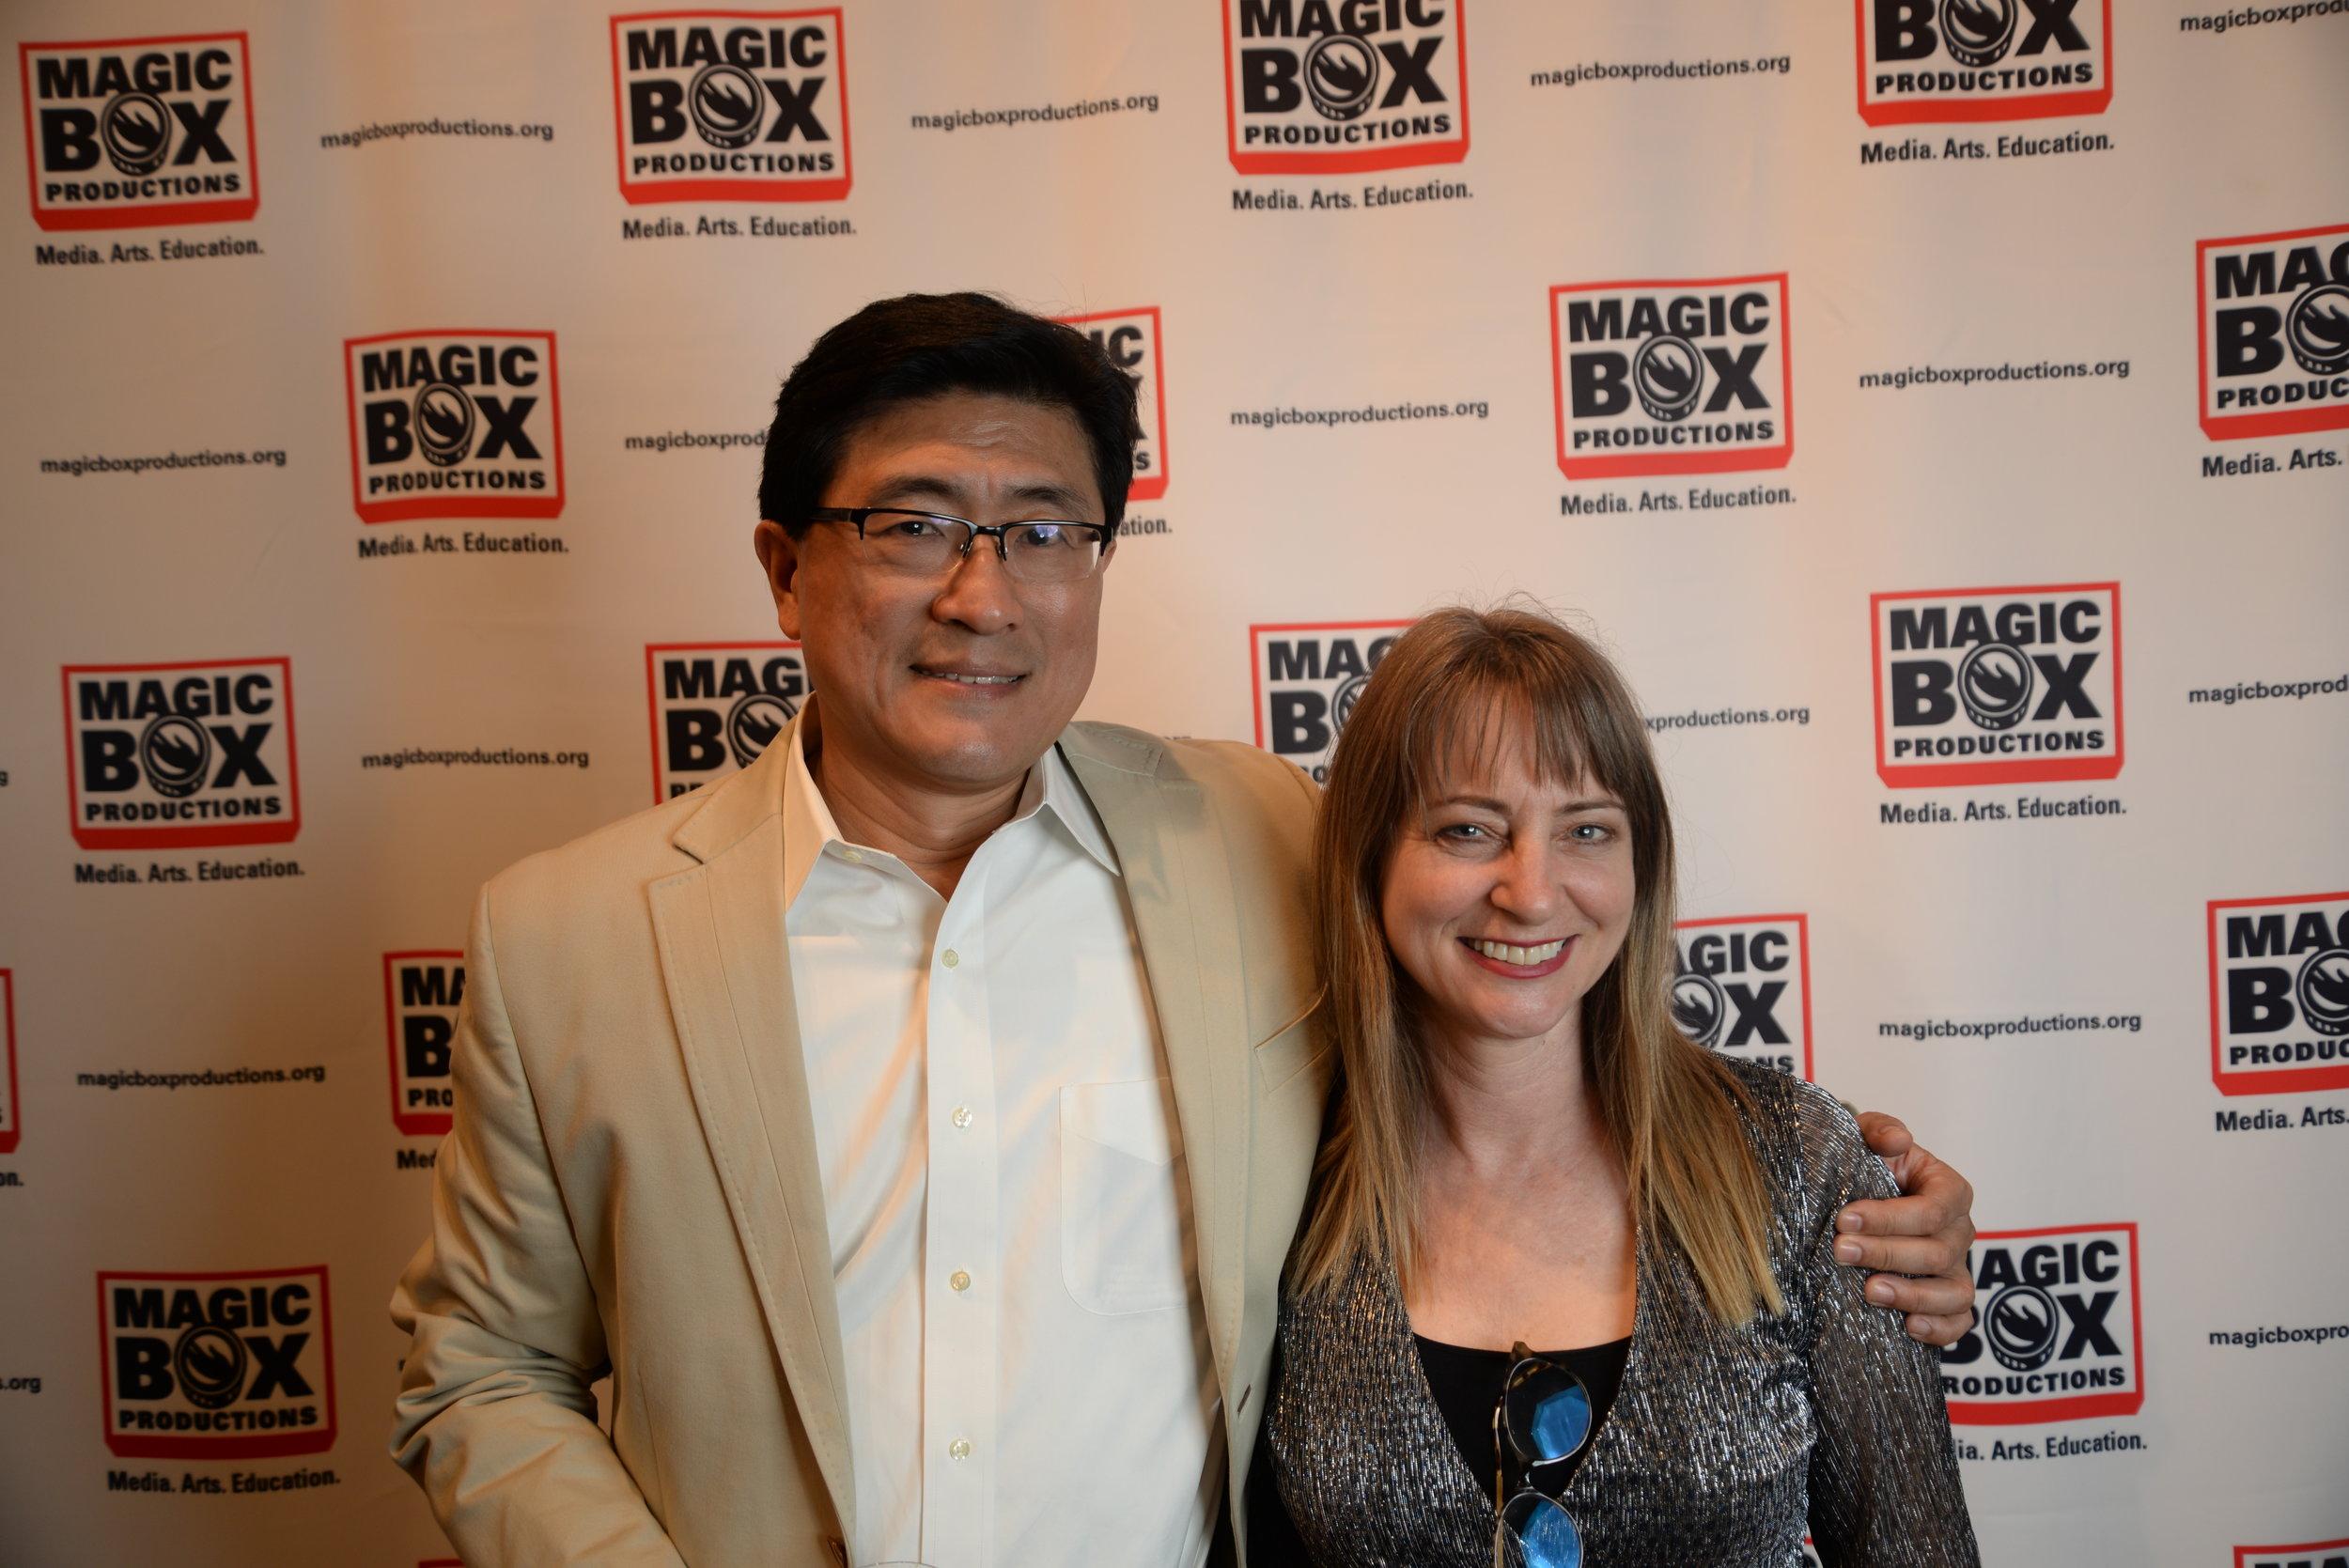 Kurt Sung and Leanna McLennan